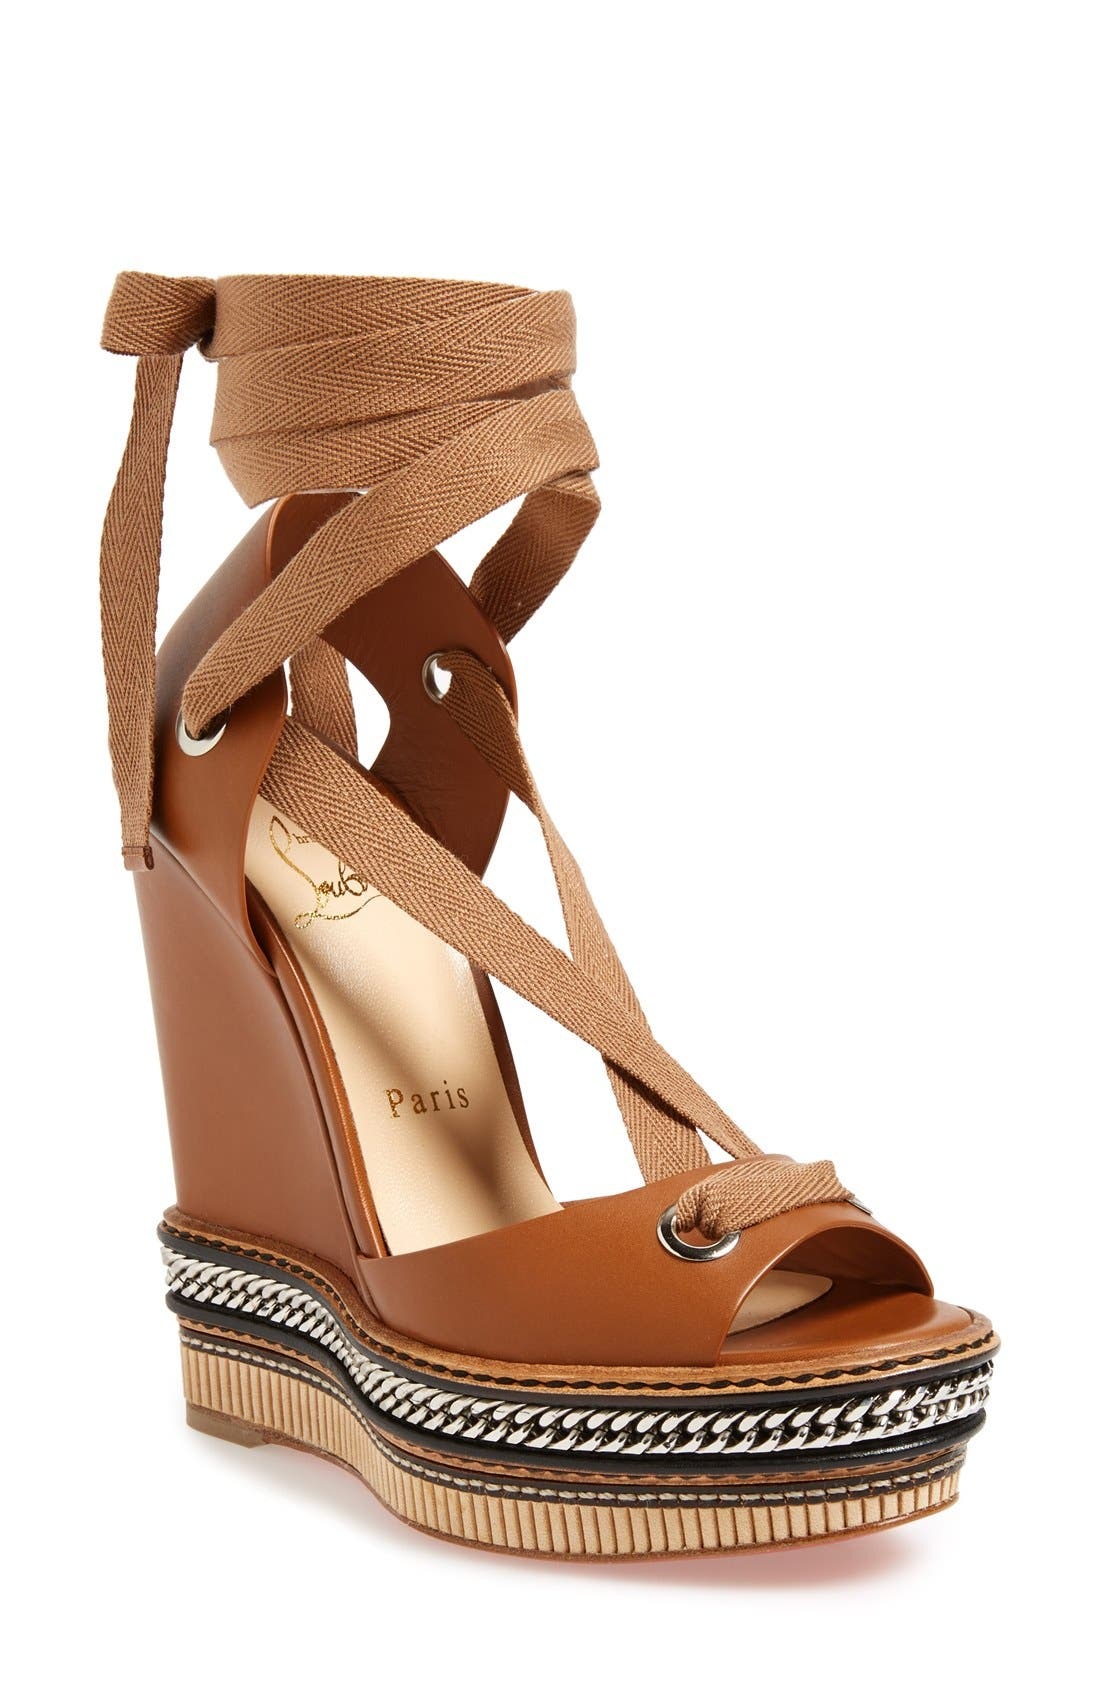 Alternate Image 1 Selected - Christian Louboutin 'Tribuli' Wedge Sandal